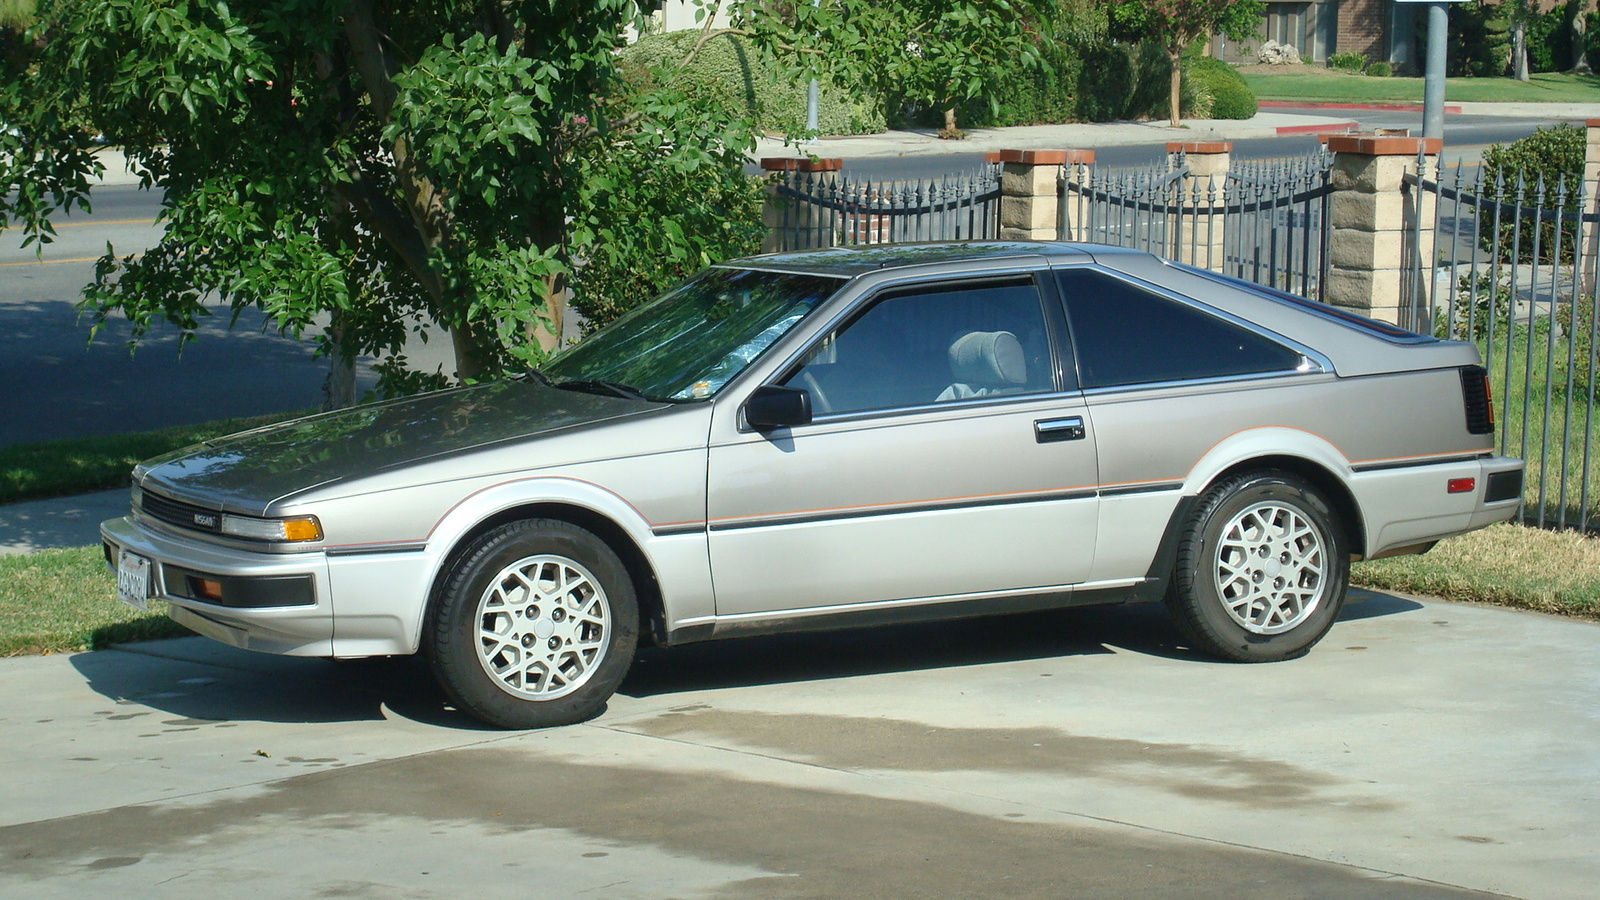 1985 Nissan Sentra For Sale | Autos Post